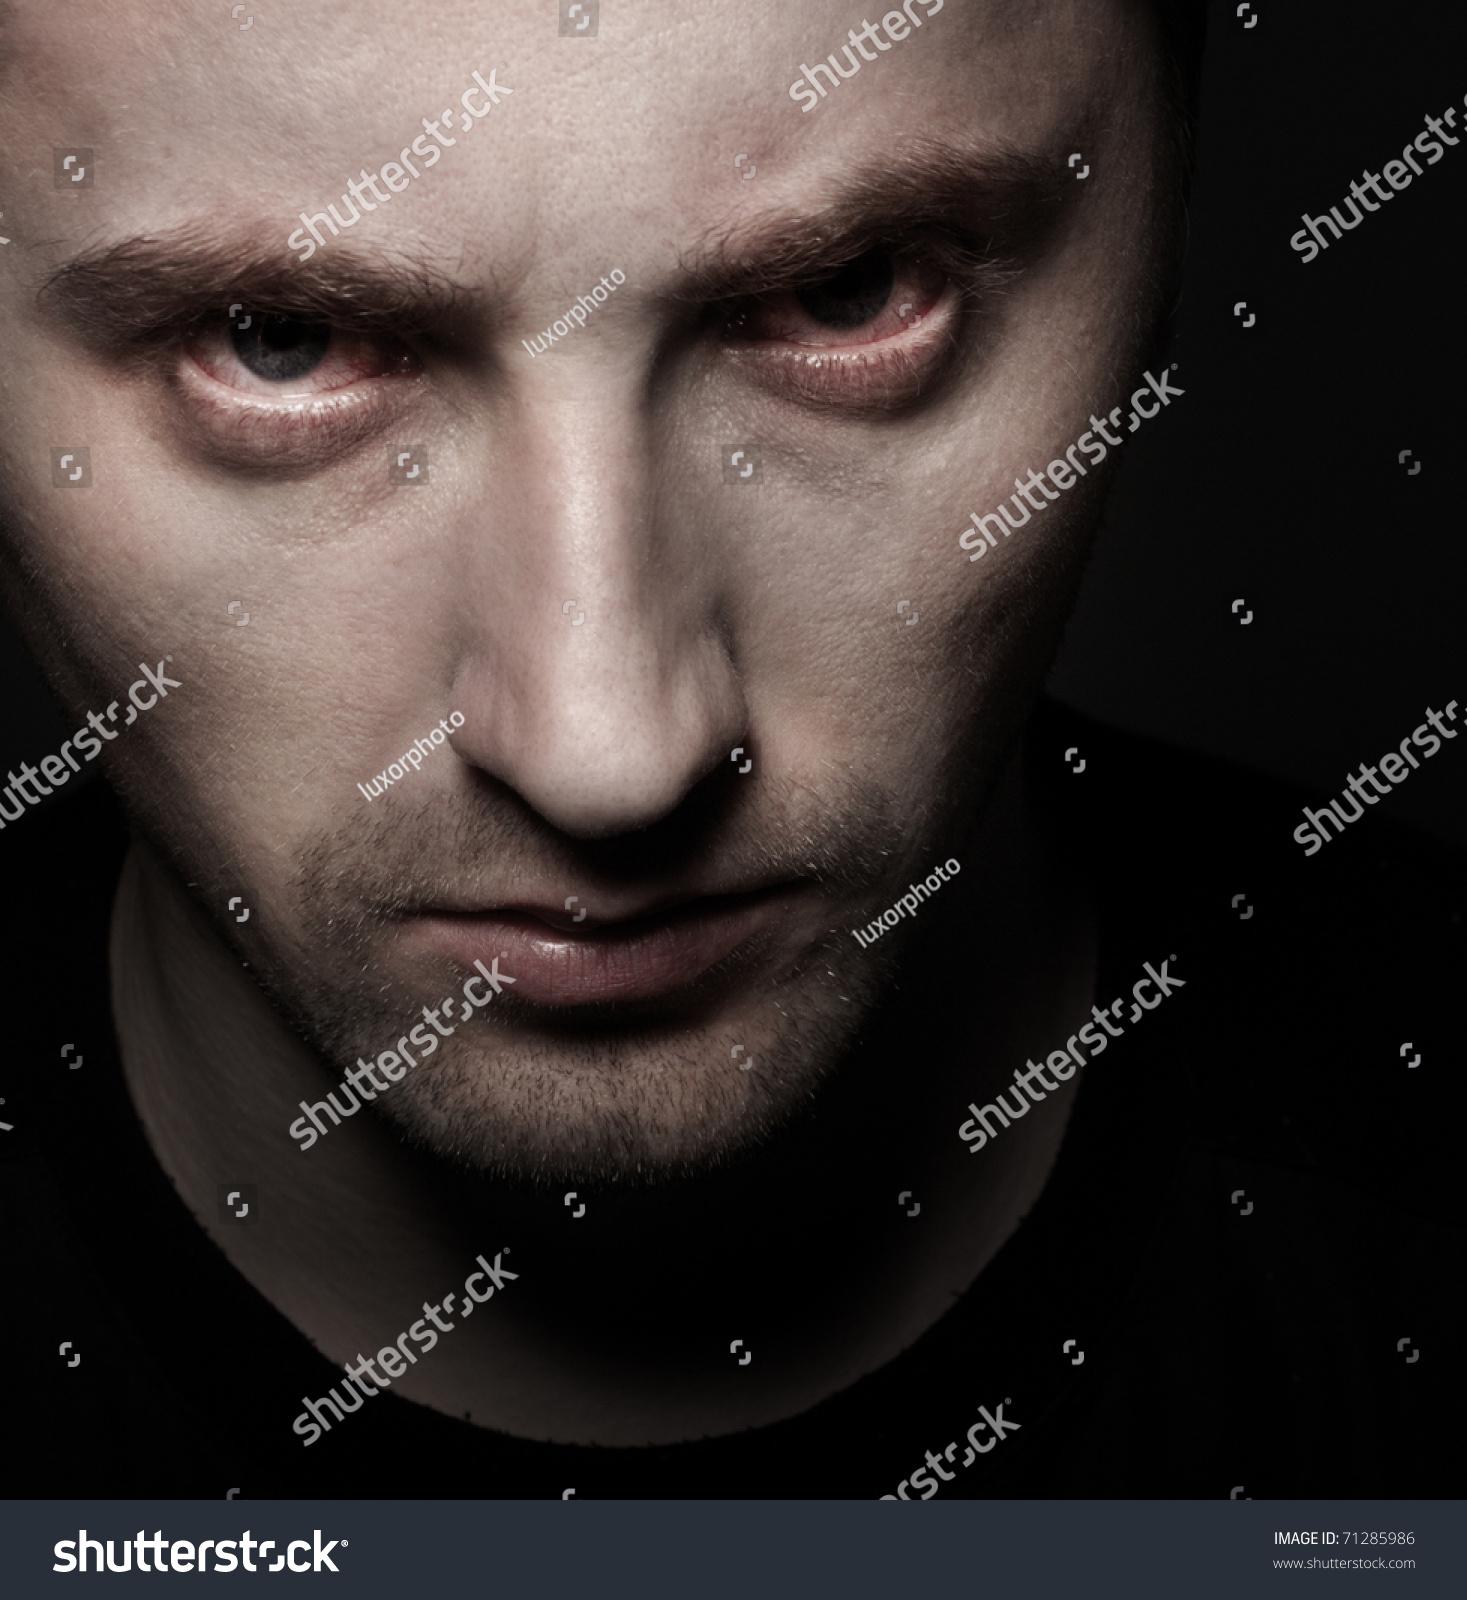 angry eyes man - photo #2